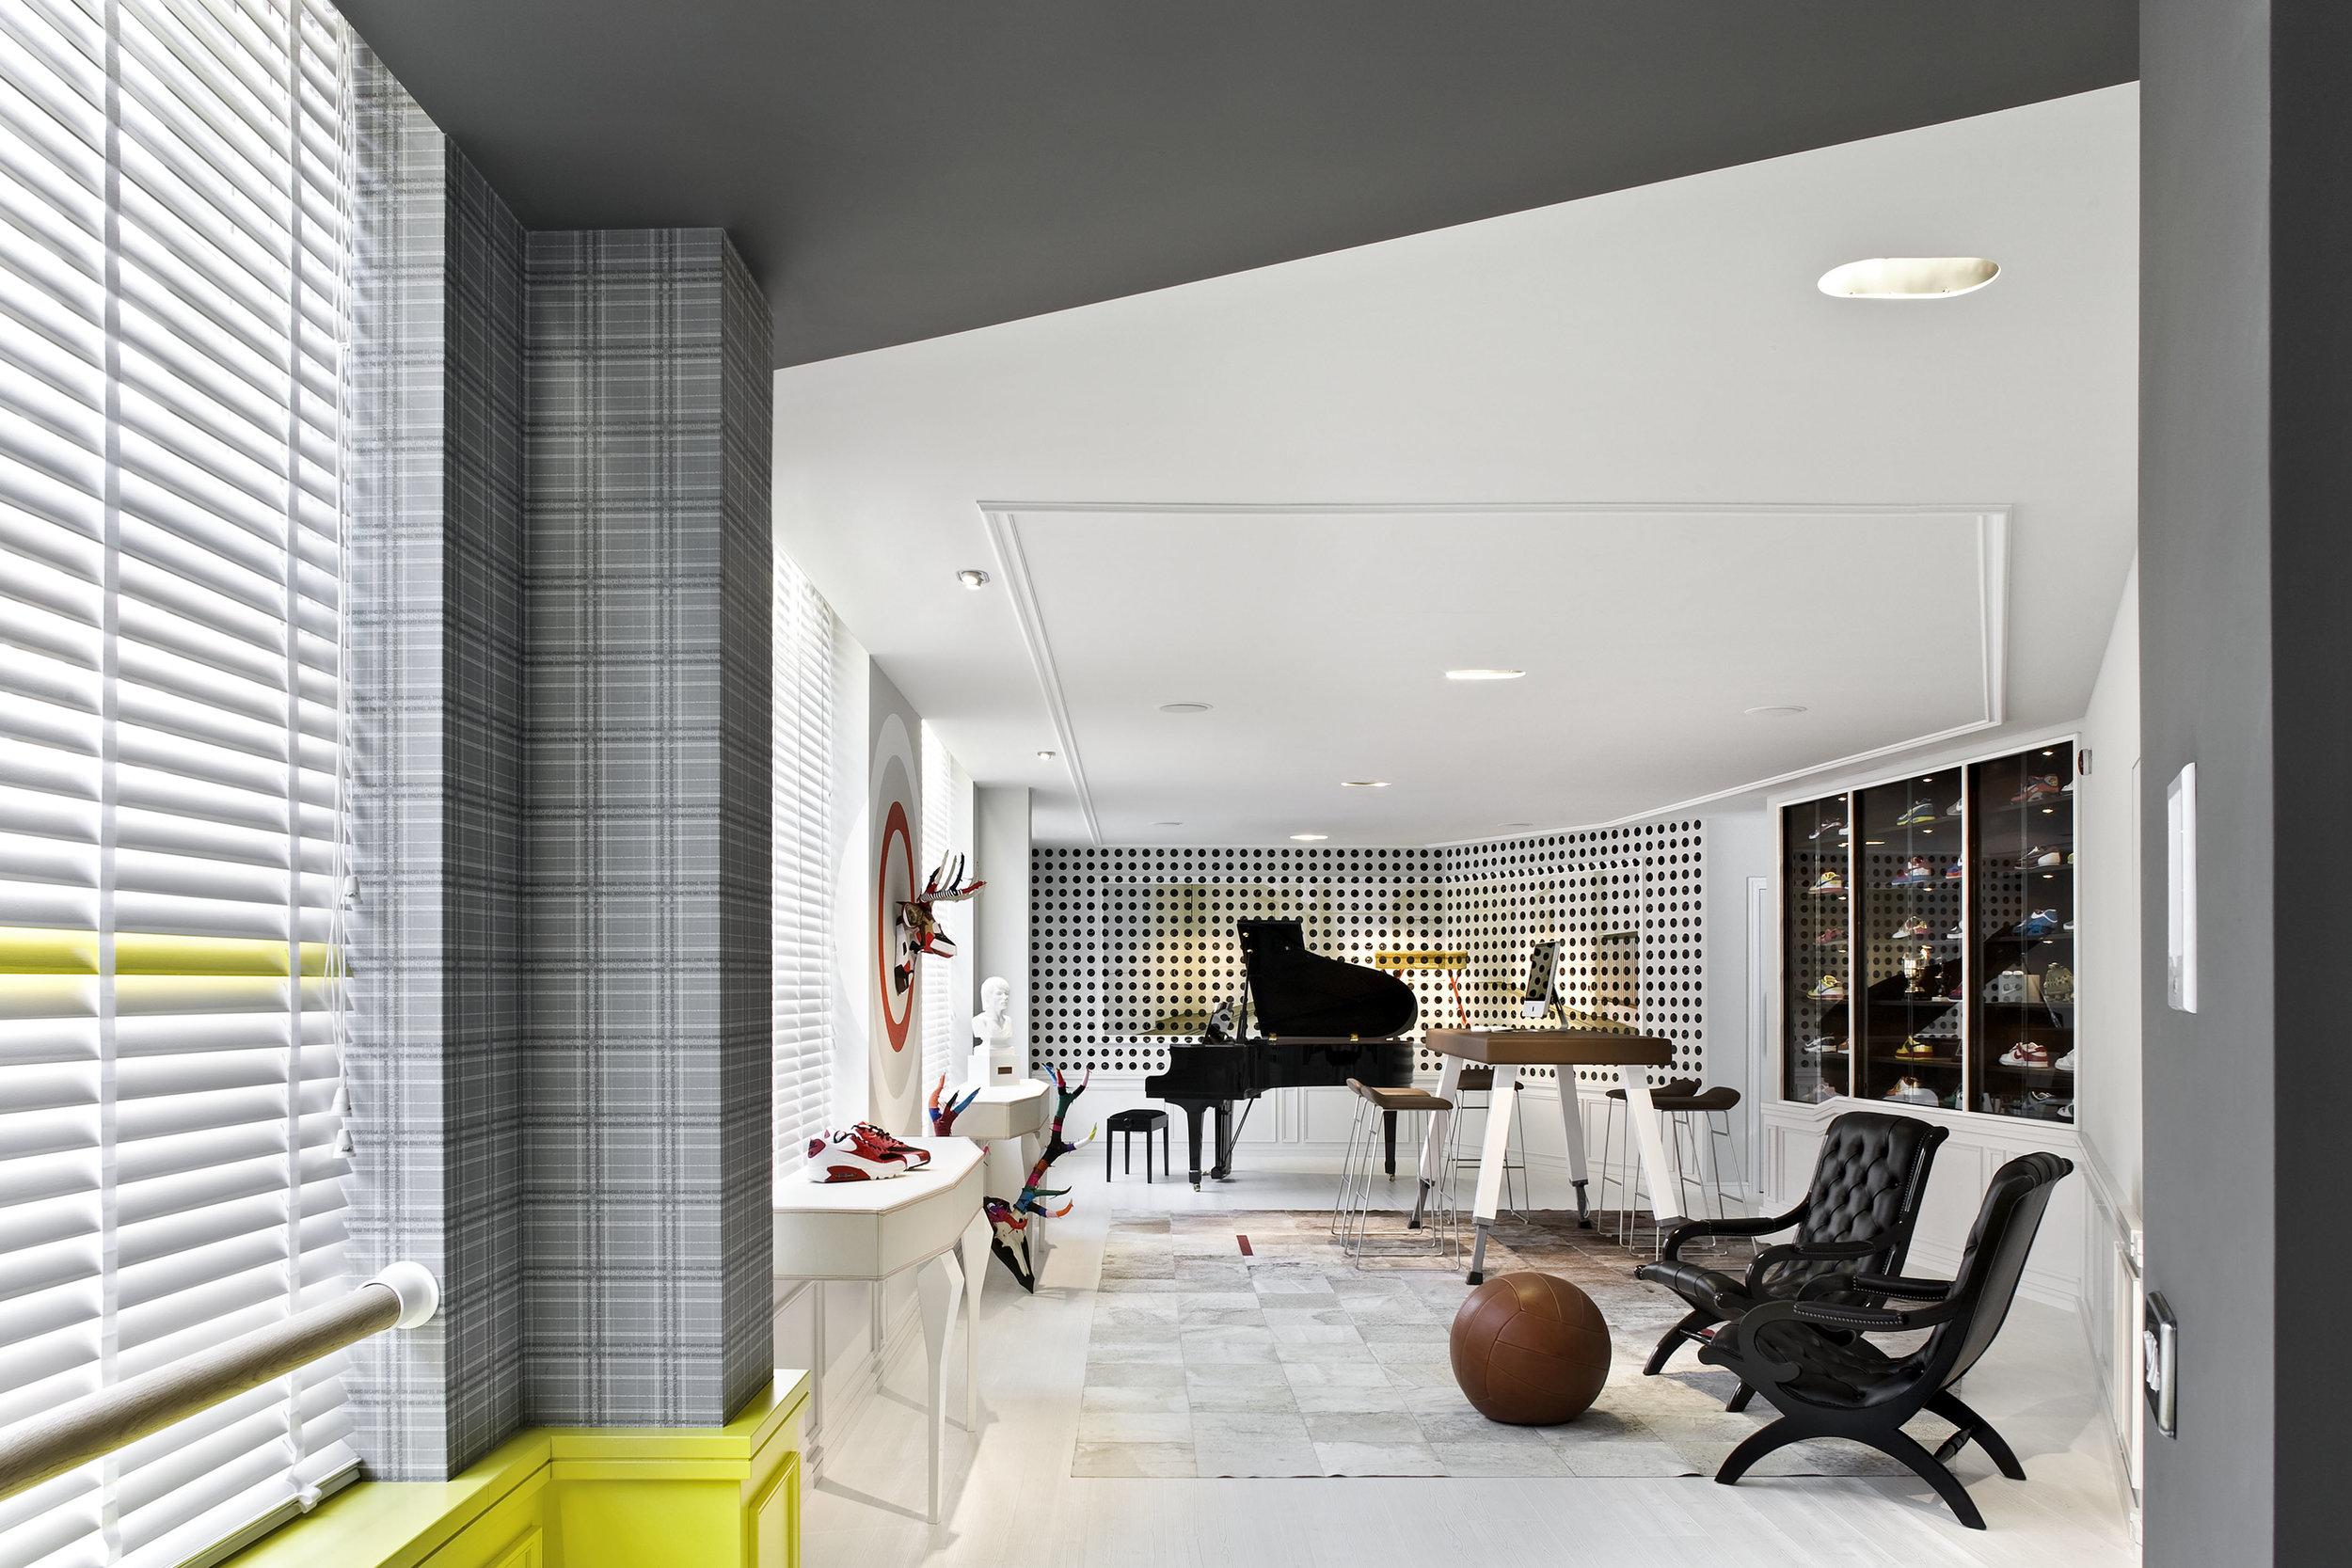 nike_coorporate-interior-design_coordination-berlin_07.jpg